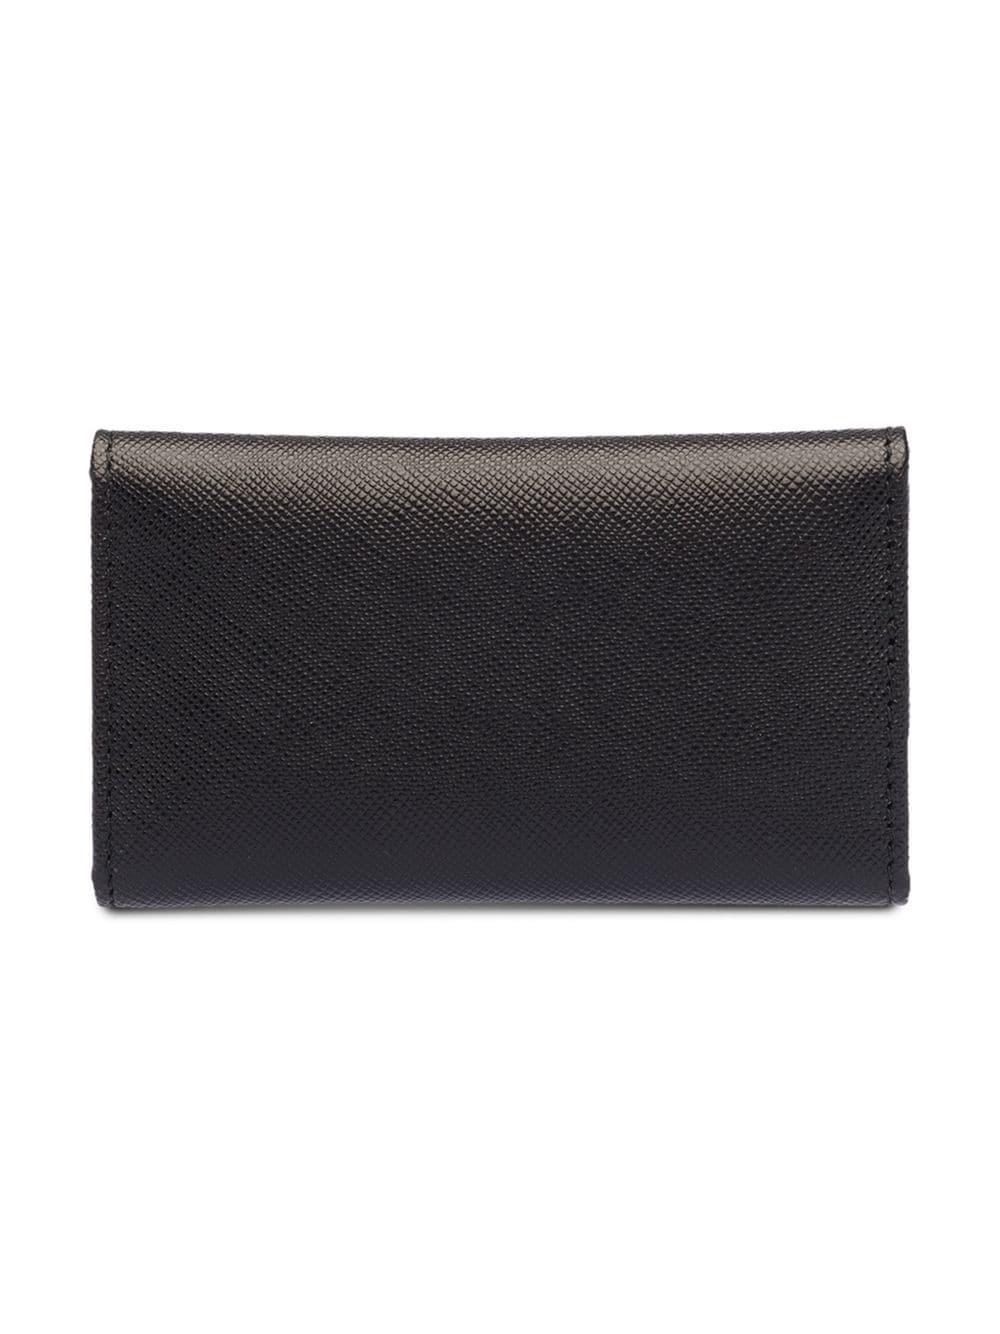 e093e06dedee Prada Leather Keyholder in Black - Lyst